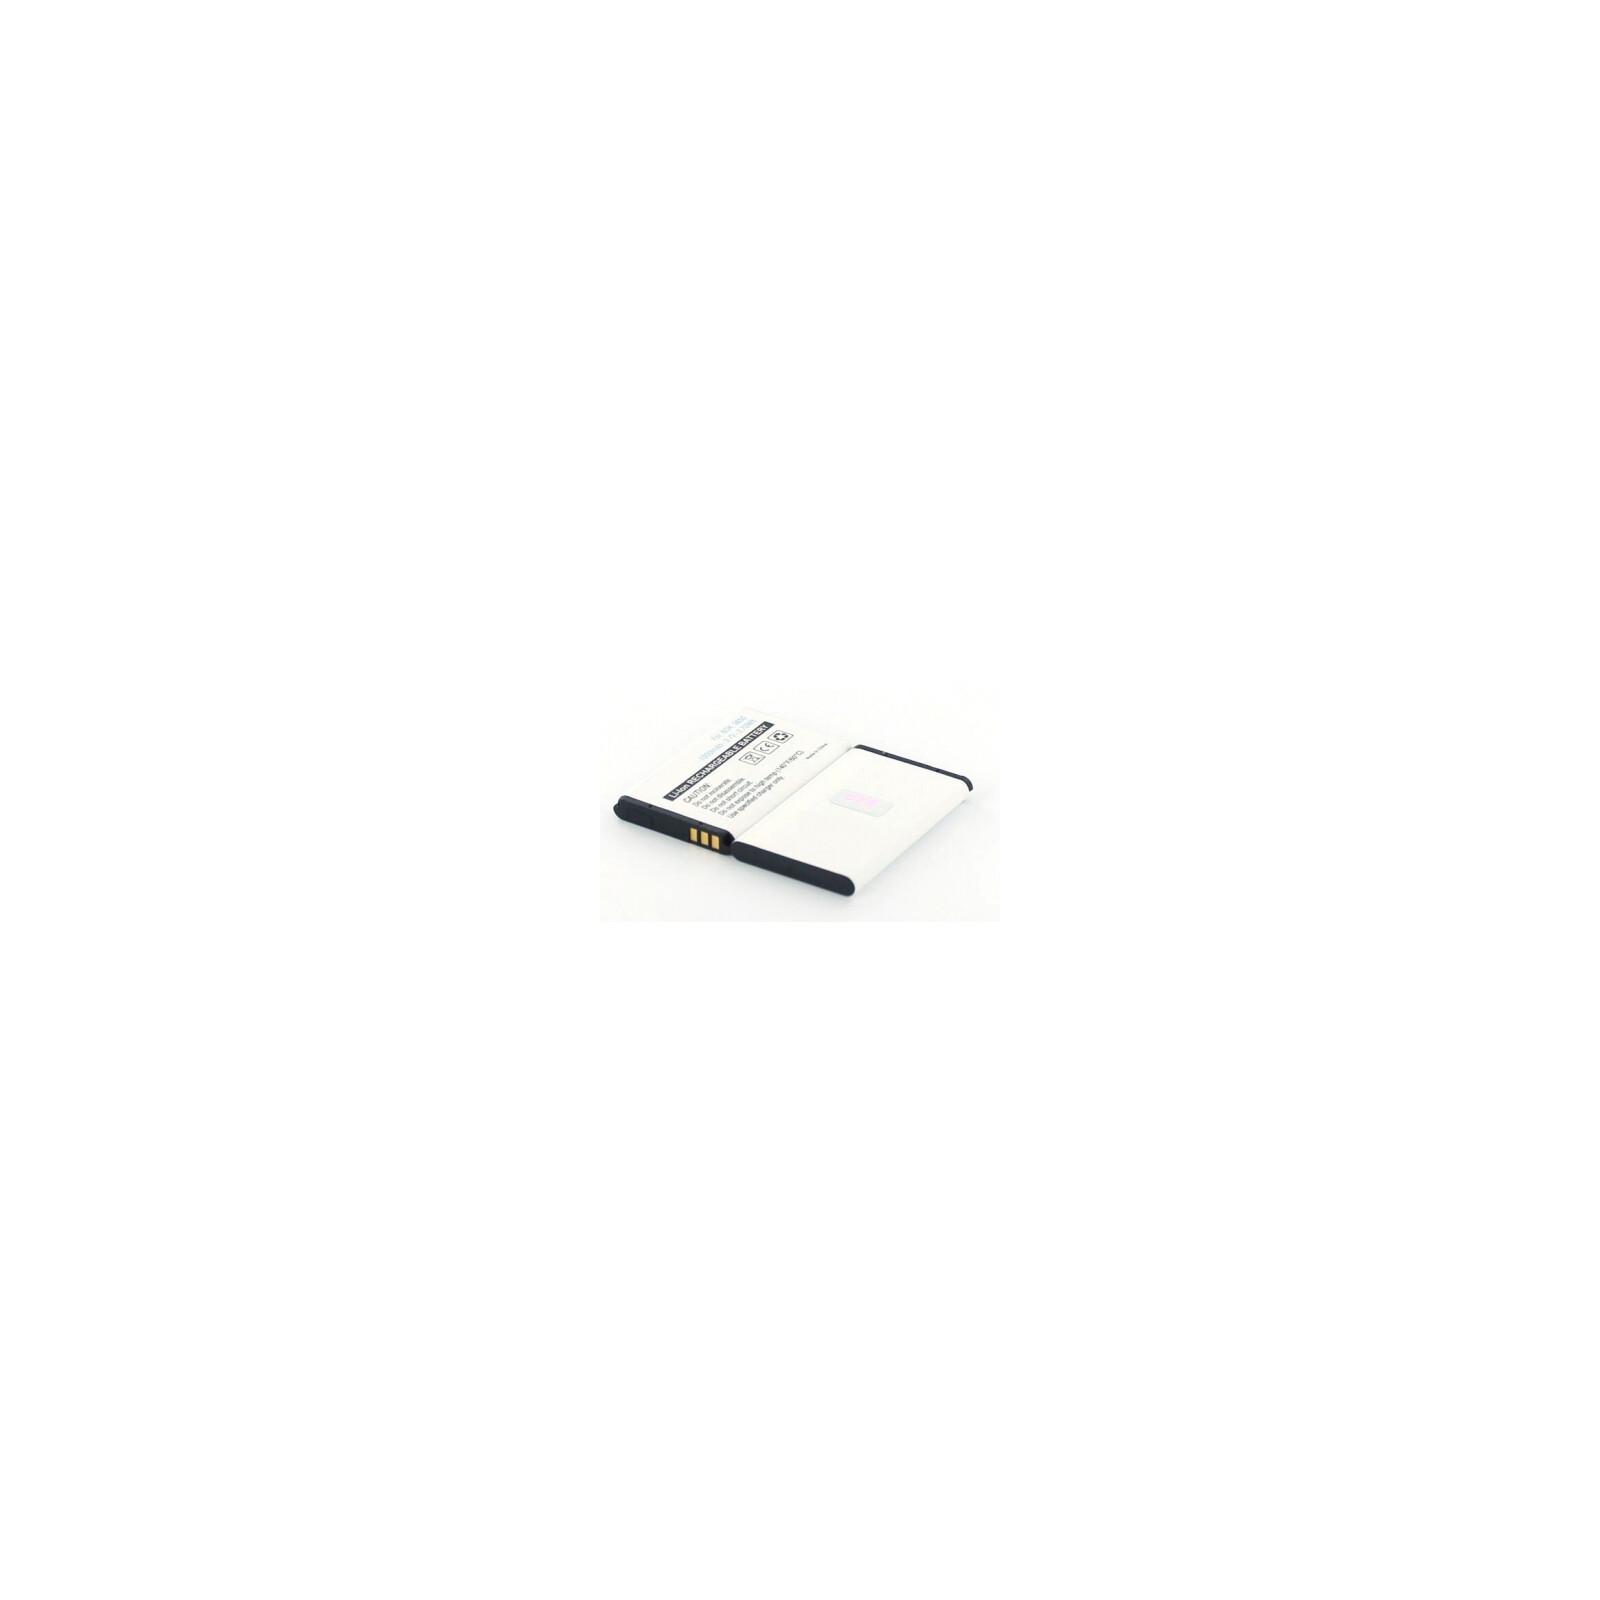 AGI Akku Nokia RM-561 1000mAh